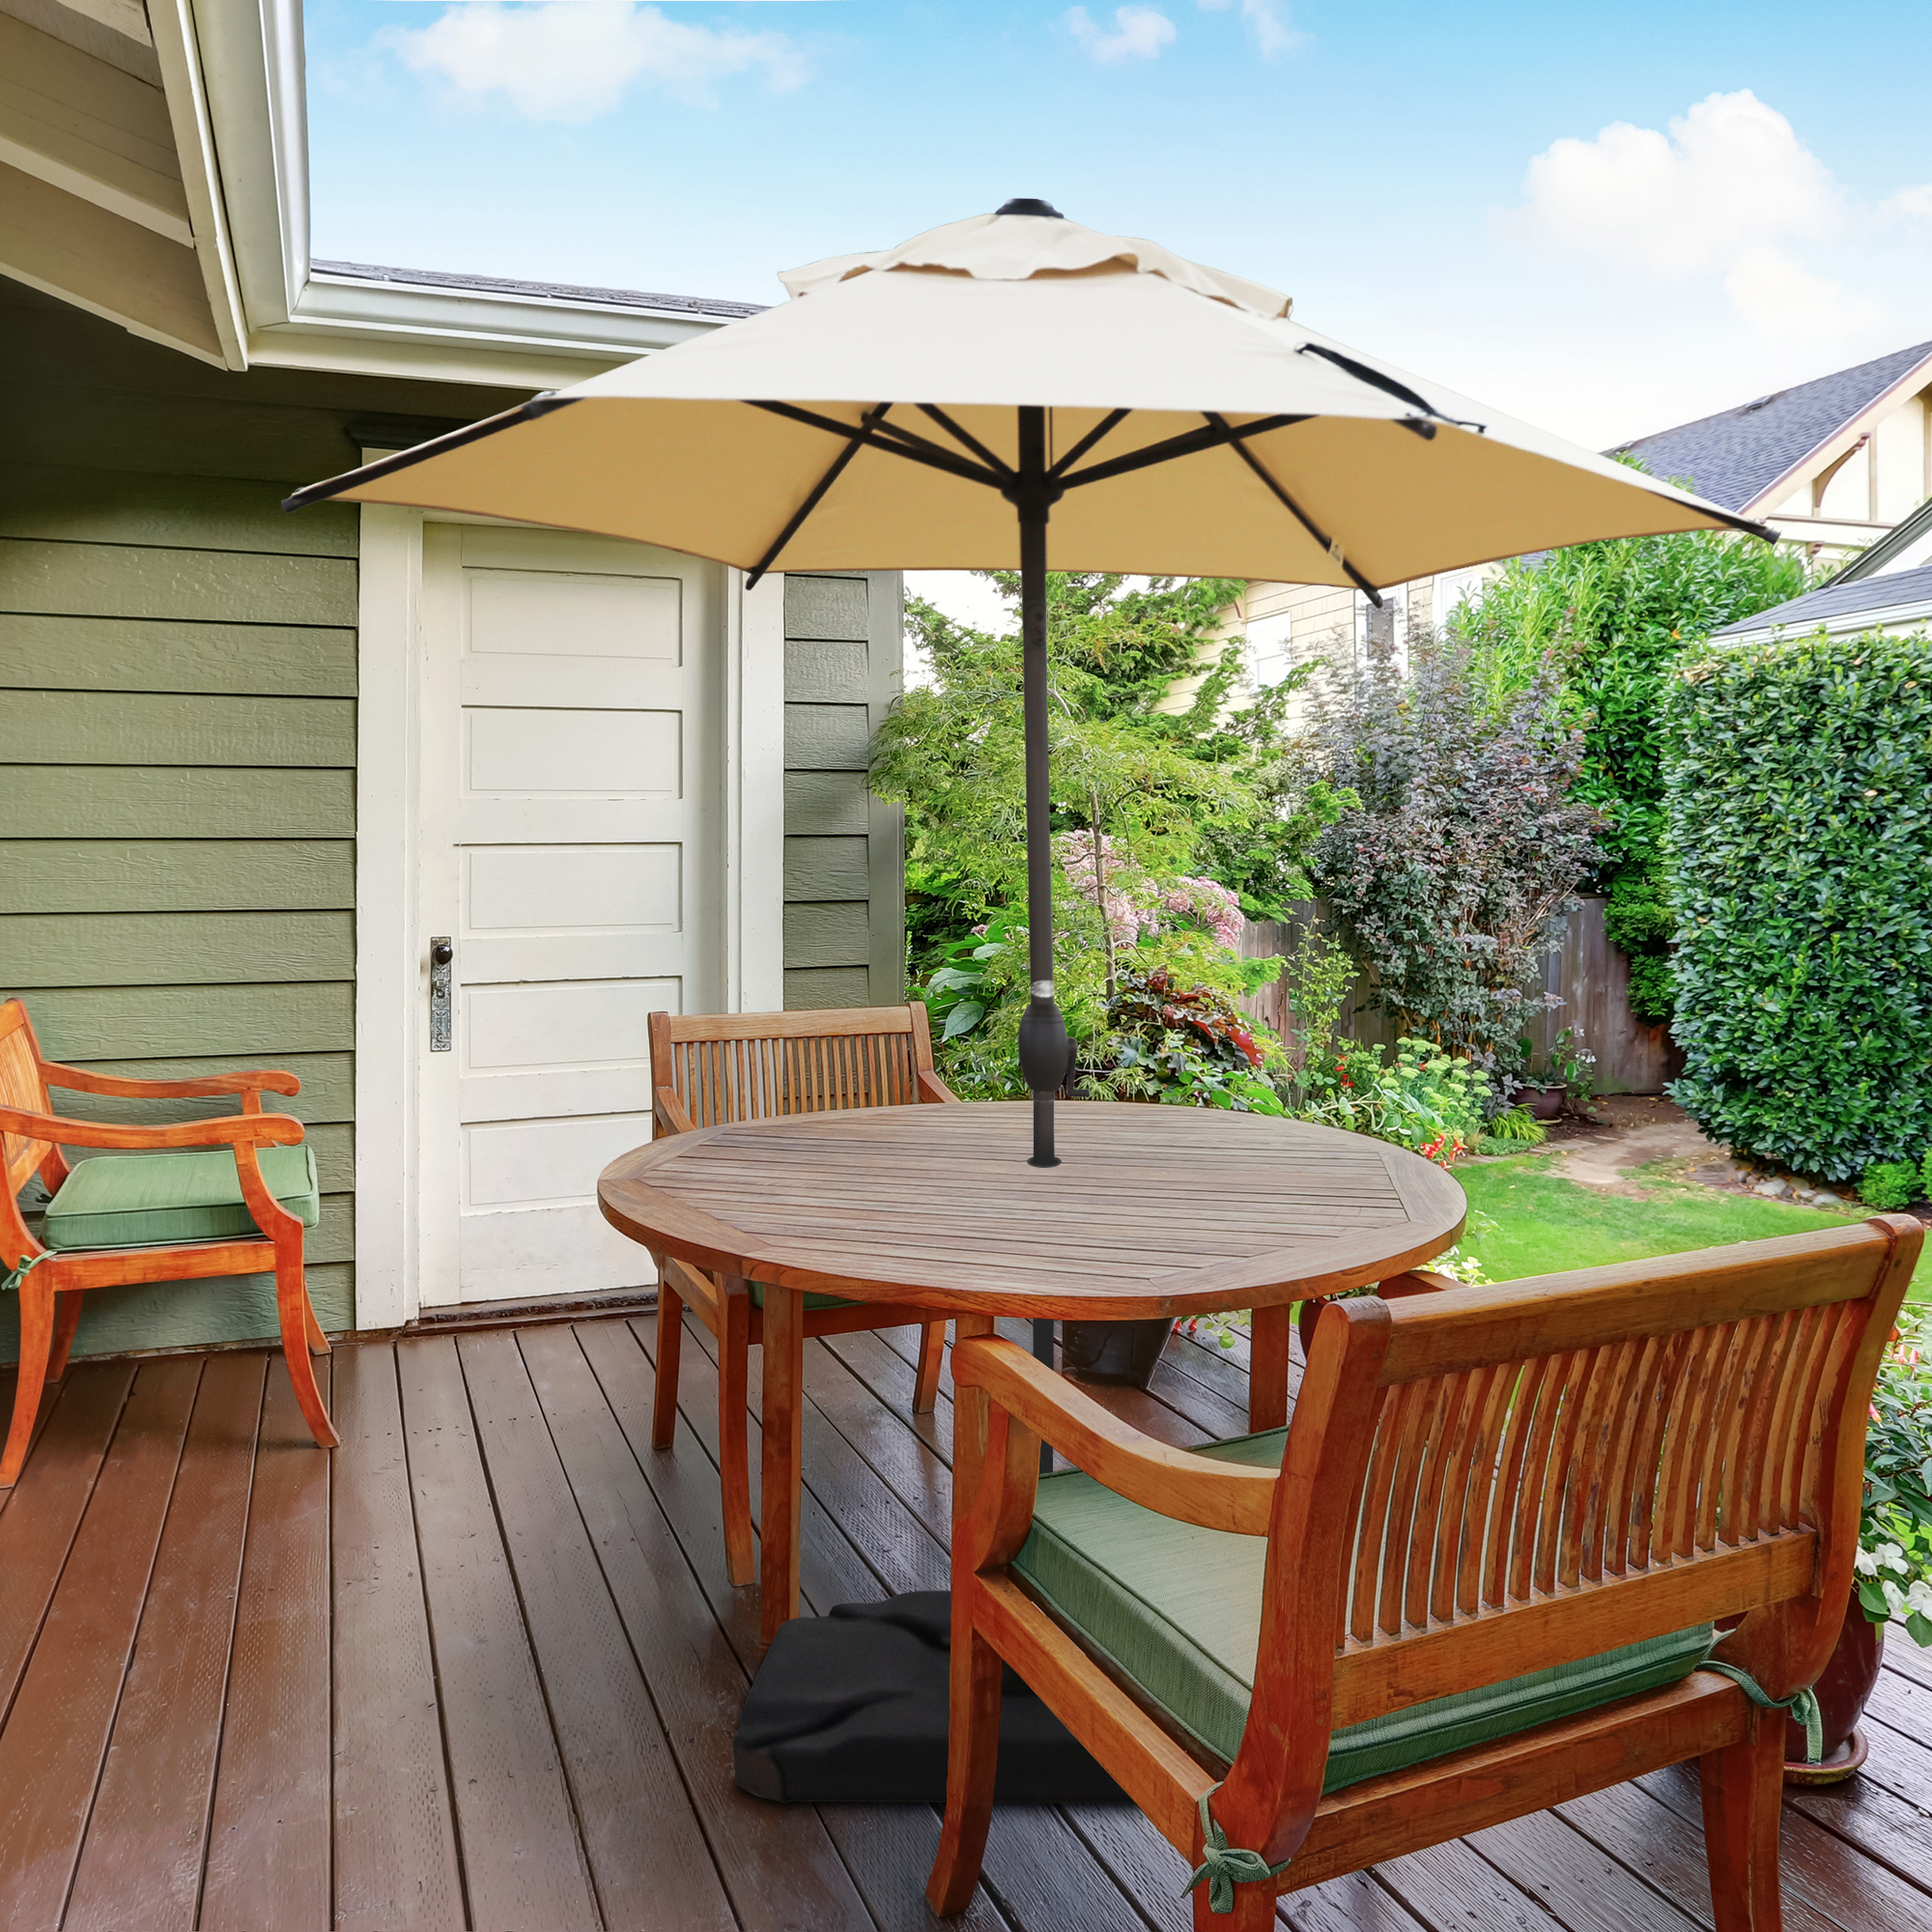 abba patio 7 5 ft round outdoor market patio umbrella with push button tilt and crank lift beige walmart com